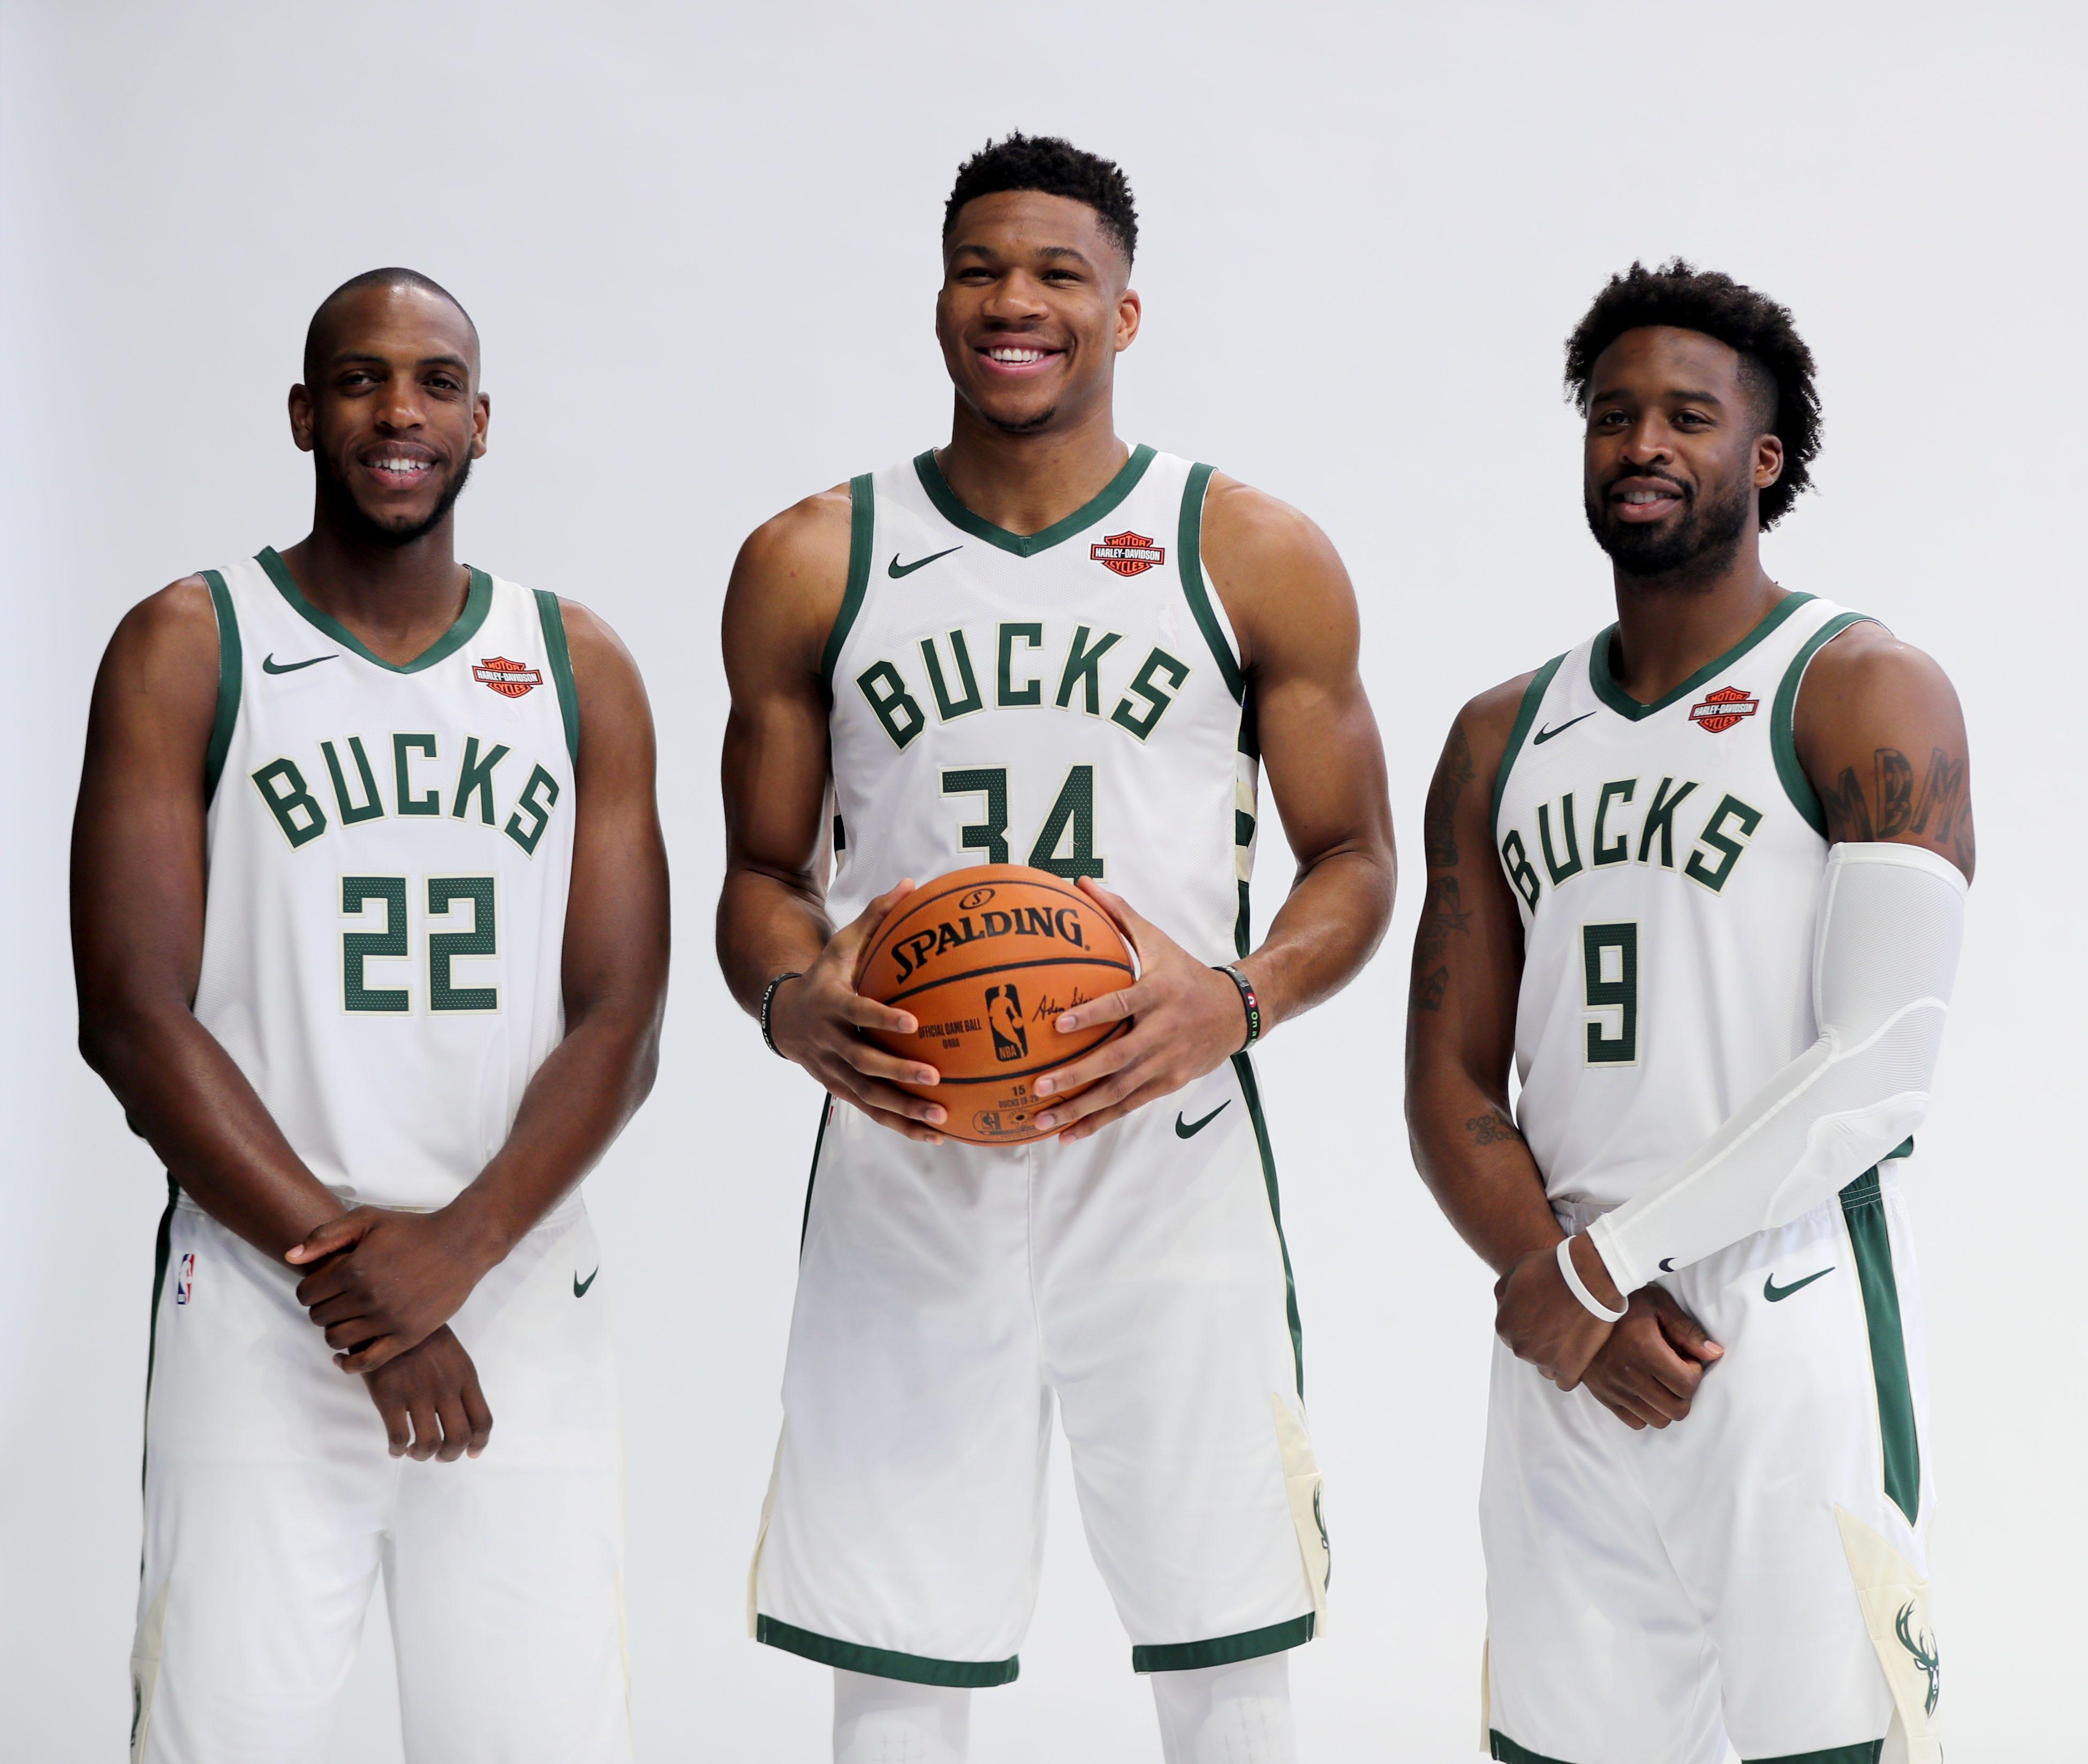 Bucks 5 Game Preseason Schedule Begins Monday After Scrimmage Sunday